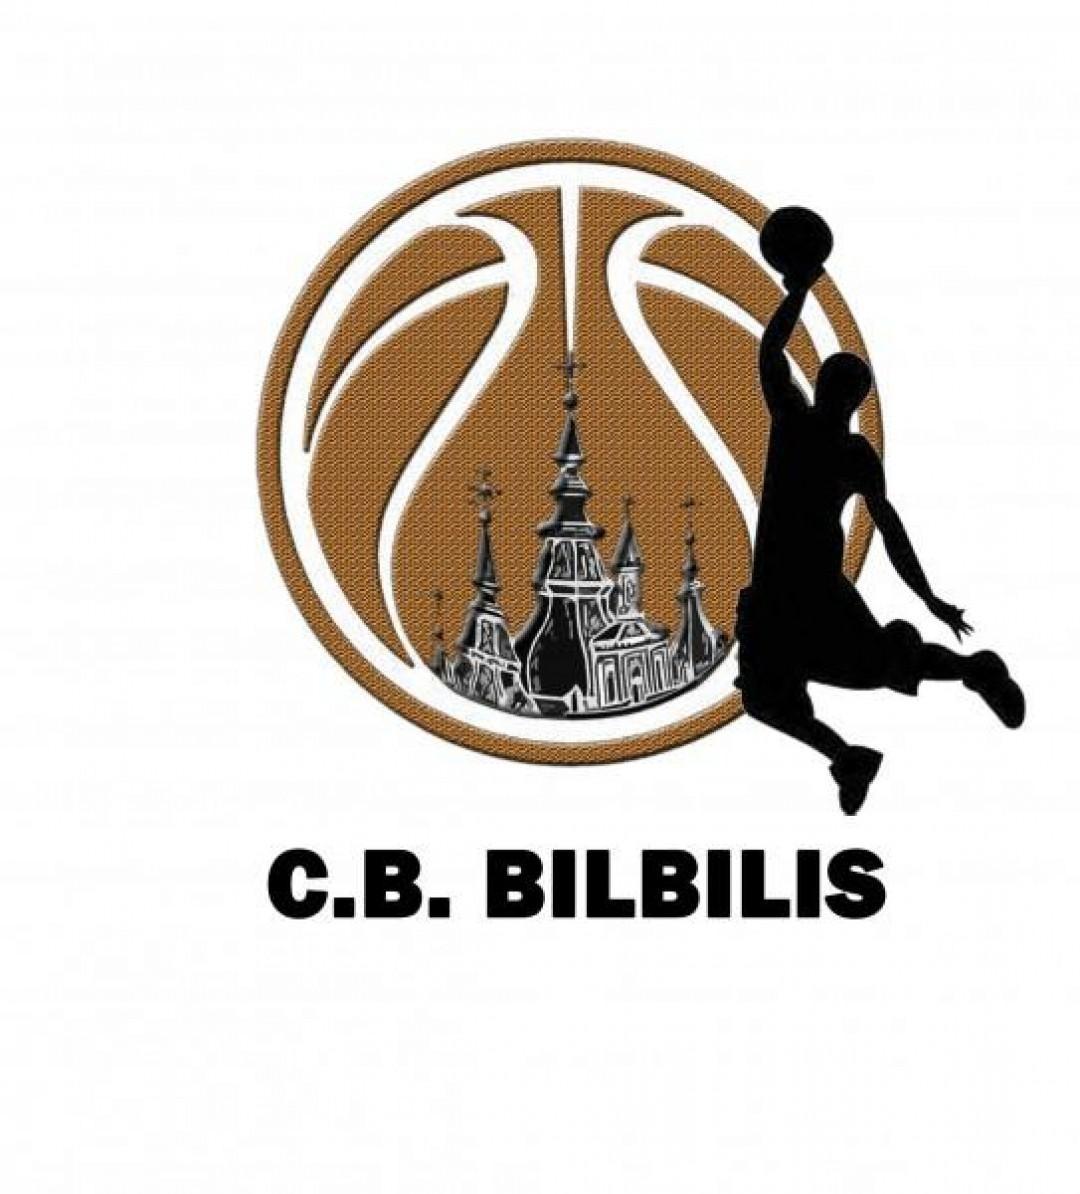 CB BILBILIS